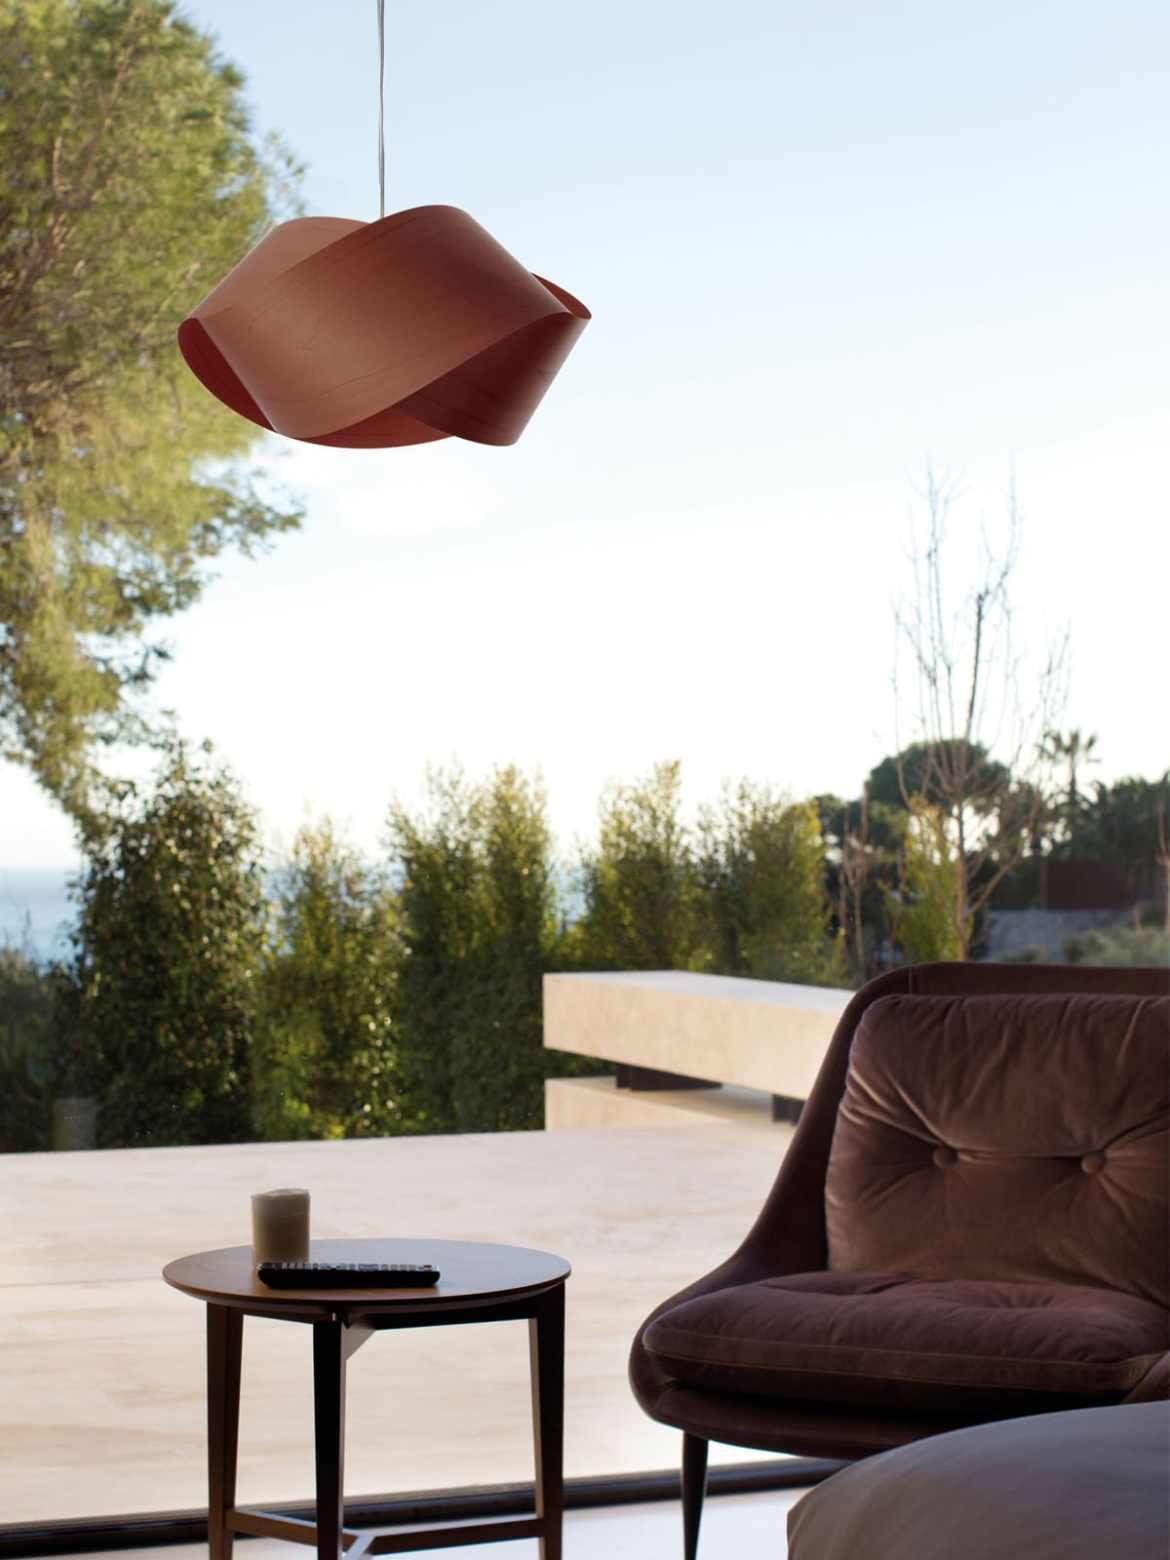 DesignOrt Blog: Faszination Farbe: Holzfurnier von LZF Lamps 31 chocolate LZF Lamps braun